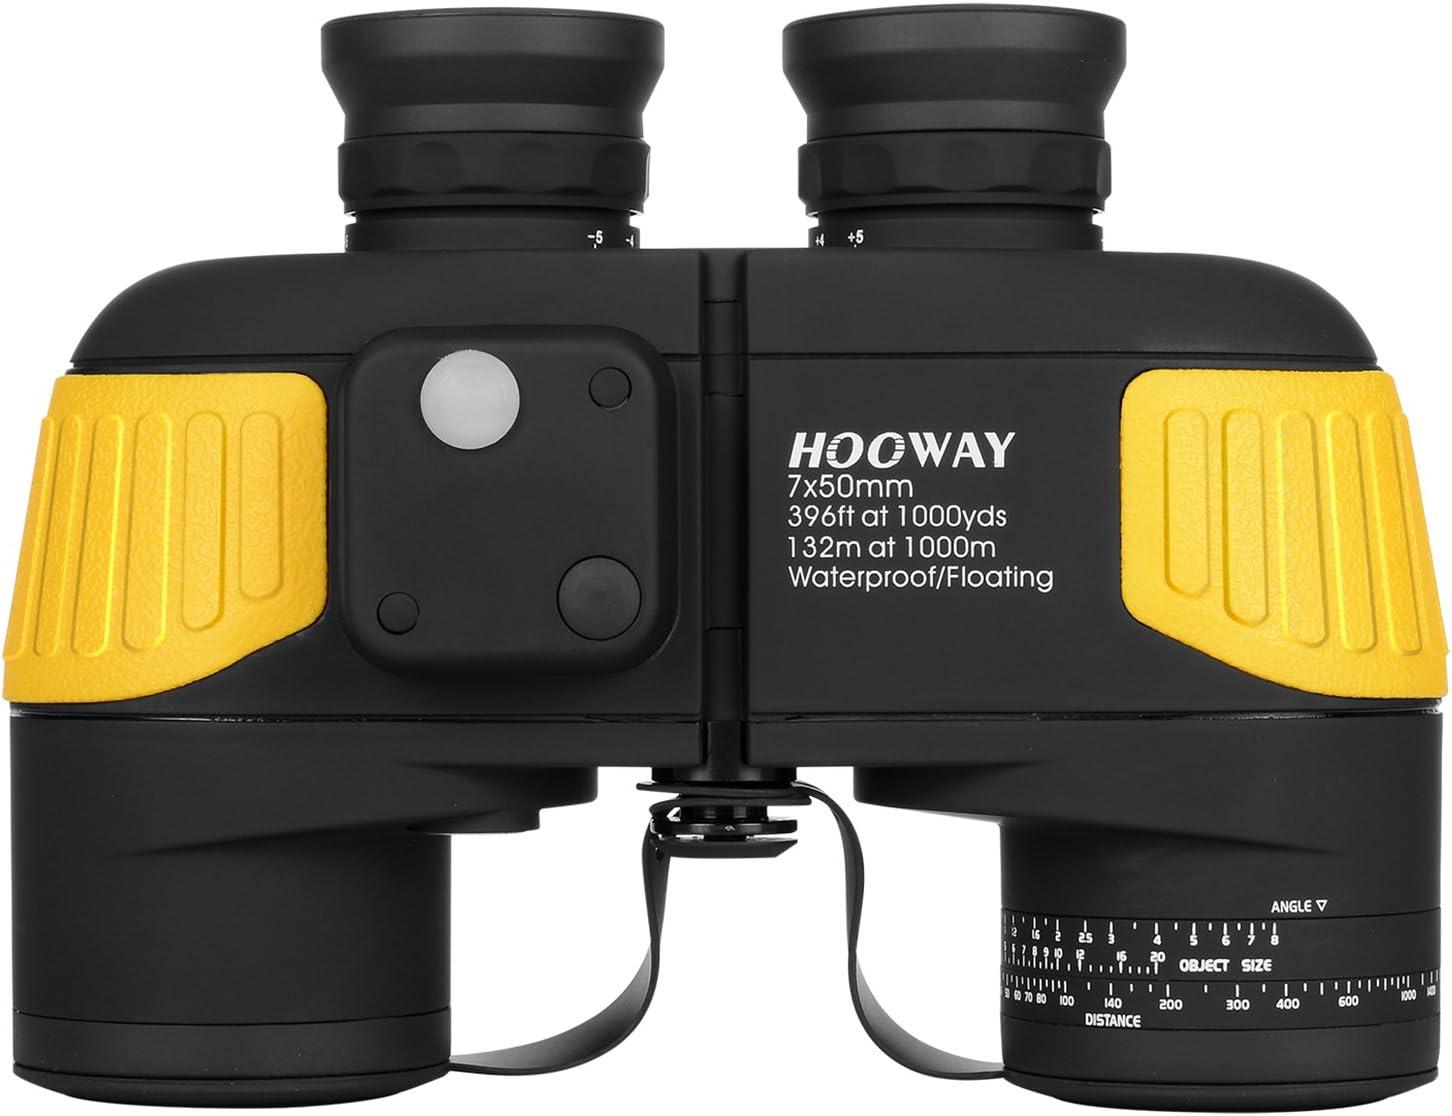 Hooway 7×50 Waterproof Fogproof Military Marine Binoculars w Internal Rangefinder Compass for Navigation,Boating,Fishing,Water Sports,Hunting and More